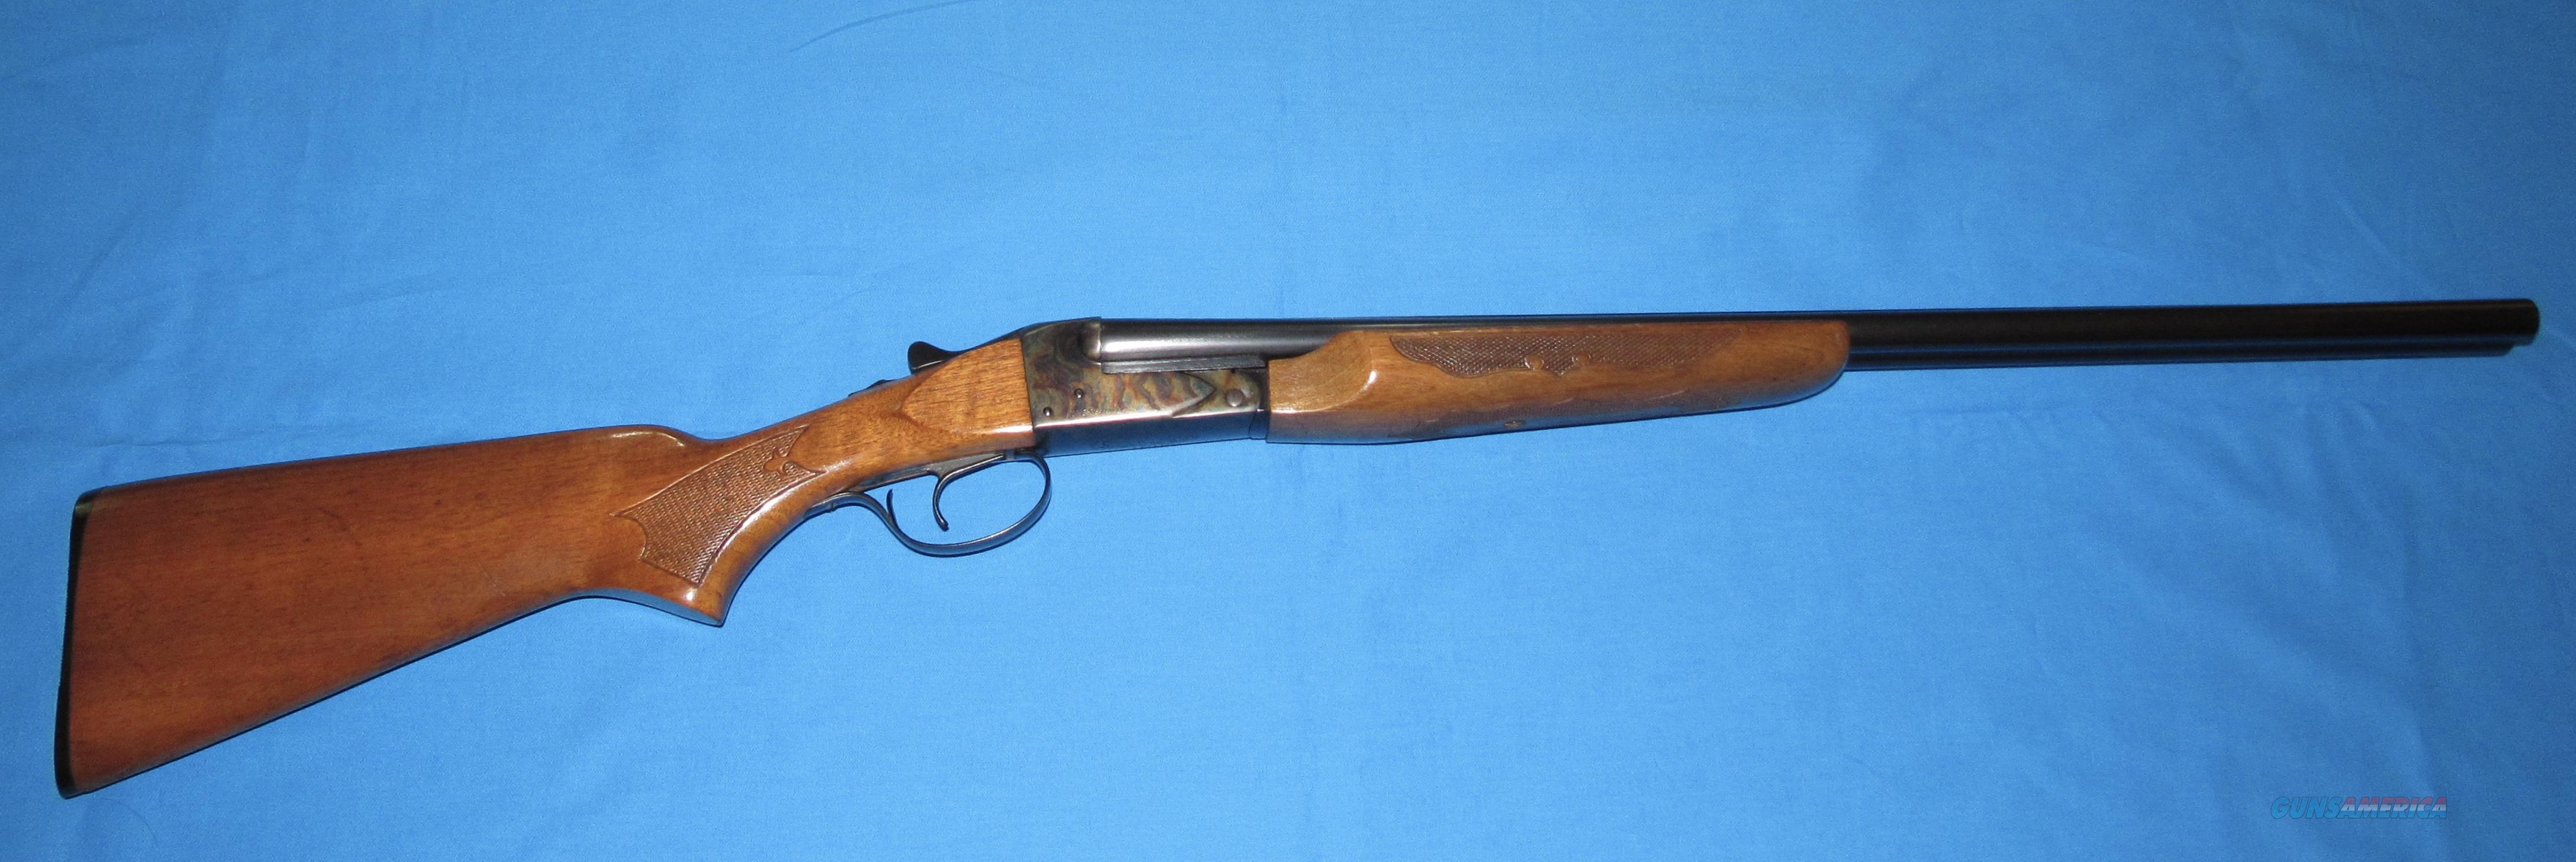 SAVAGE-FOX MODEL B-SE 20 GAUGE DOUBLE BARREL SHOTGUN  Guns > Shotguns > Fox Shotguns